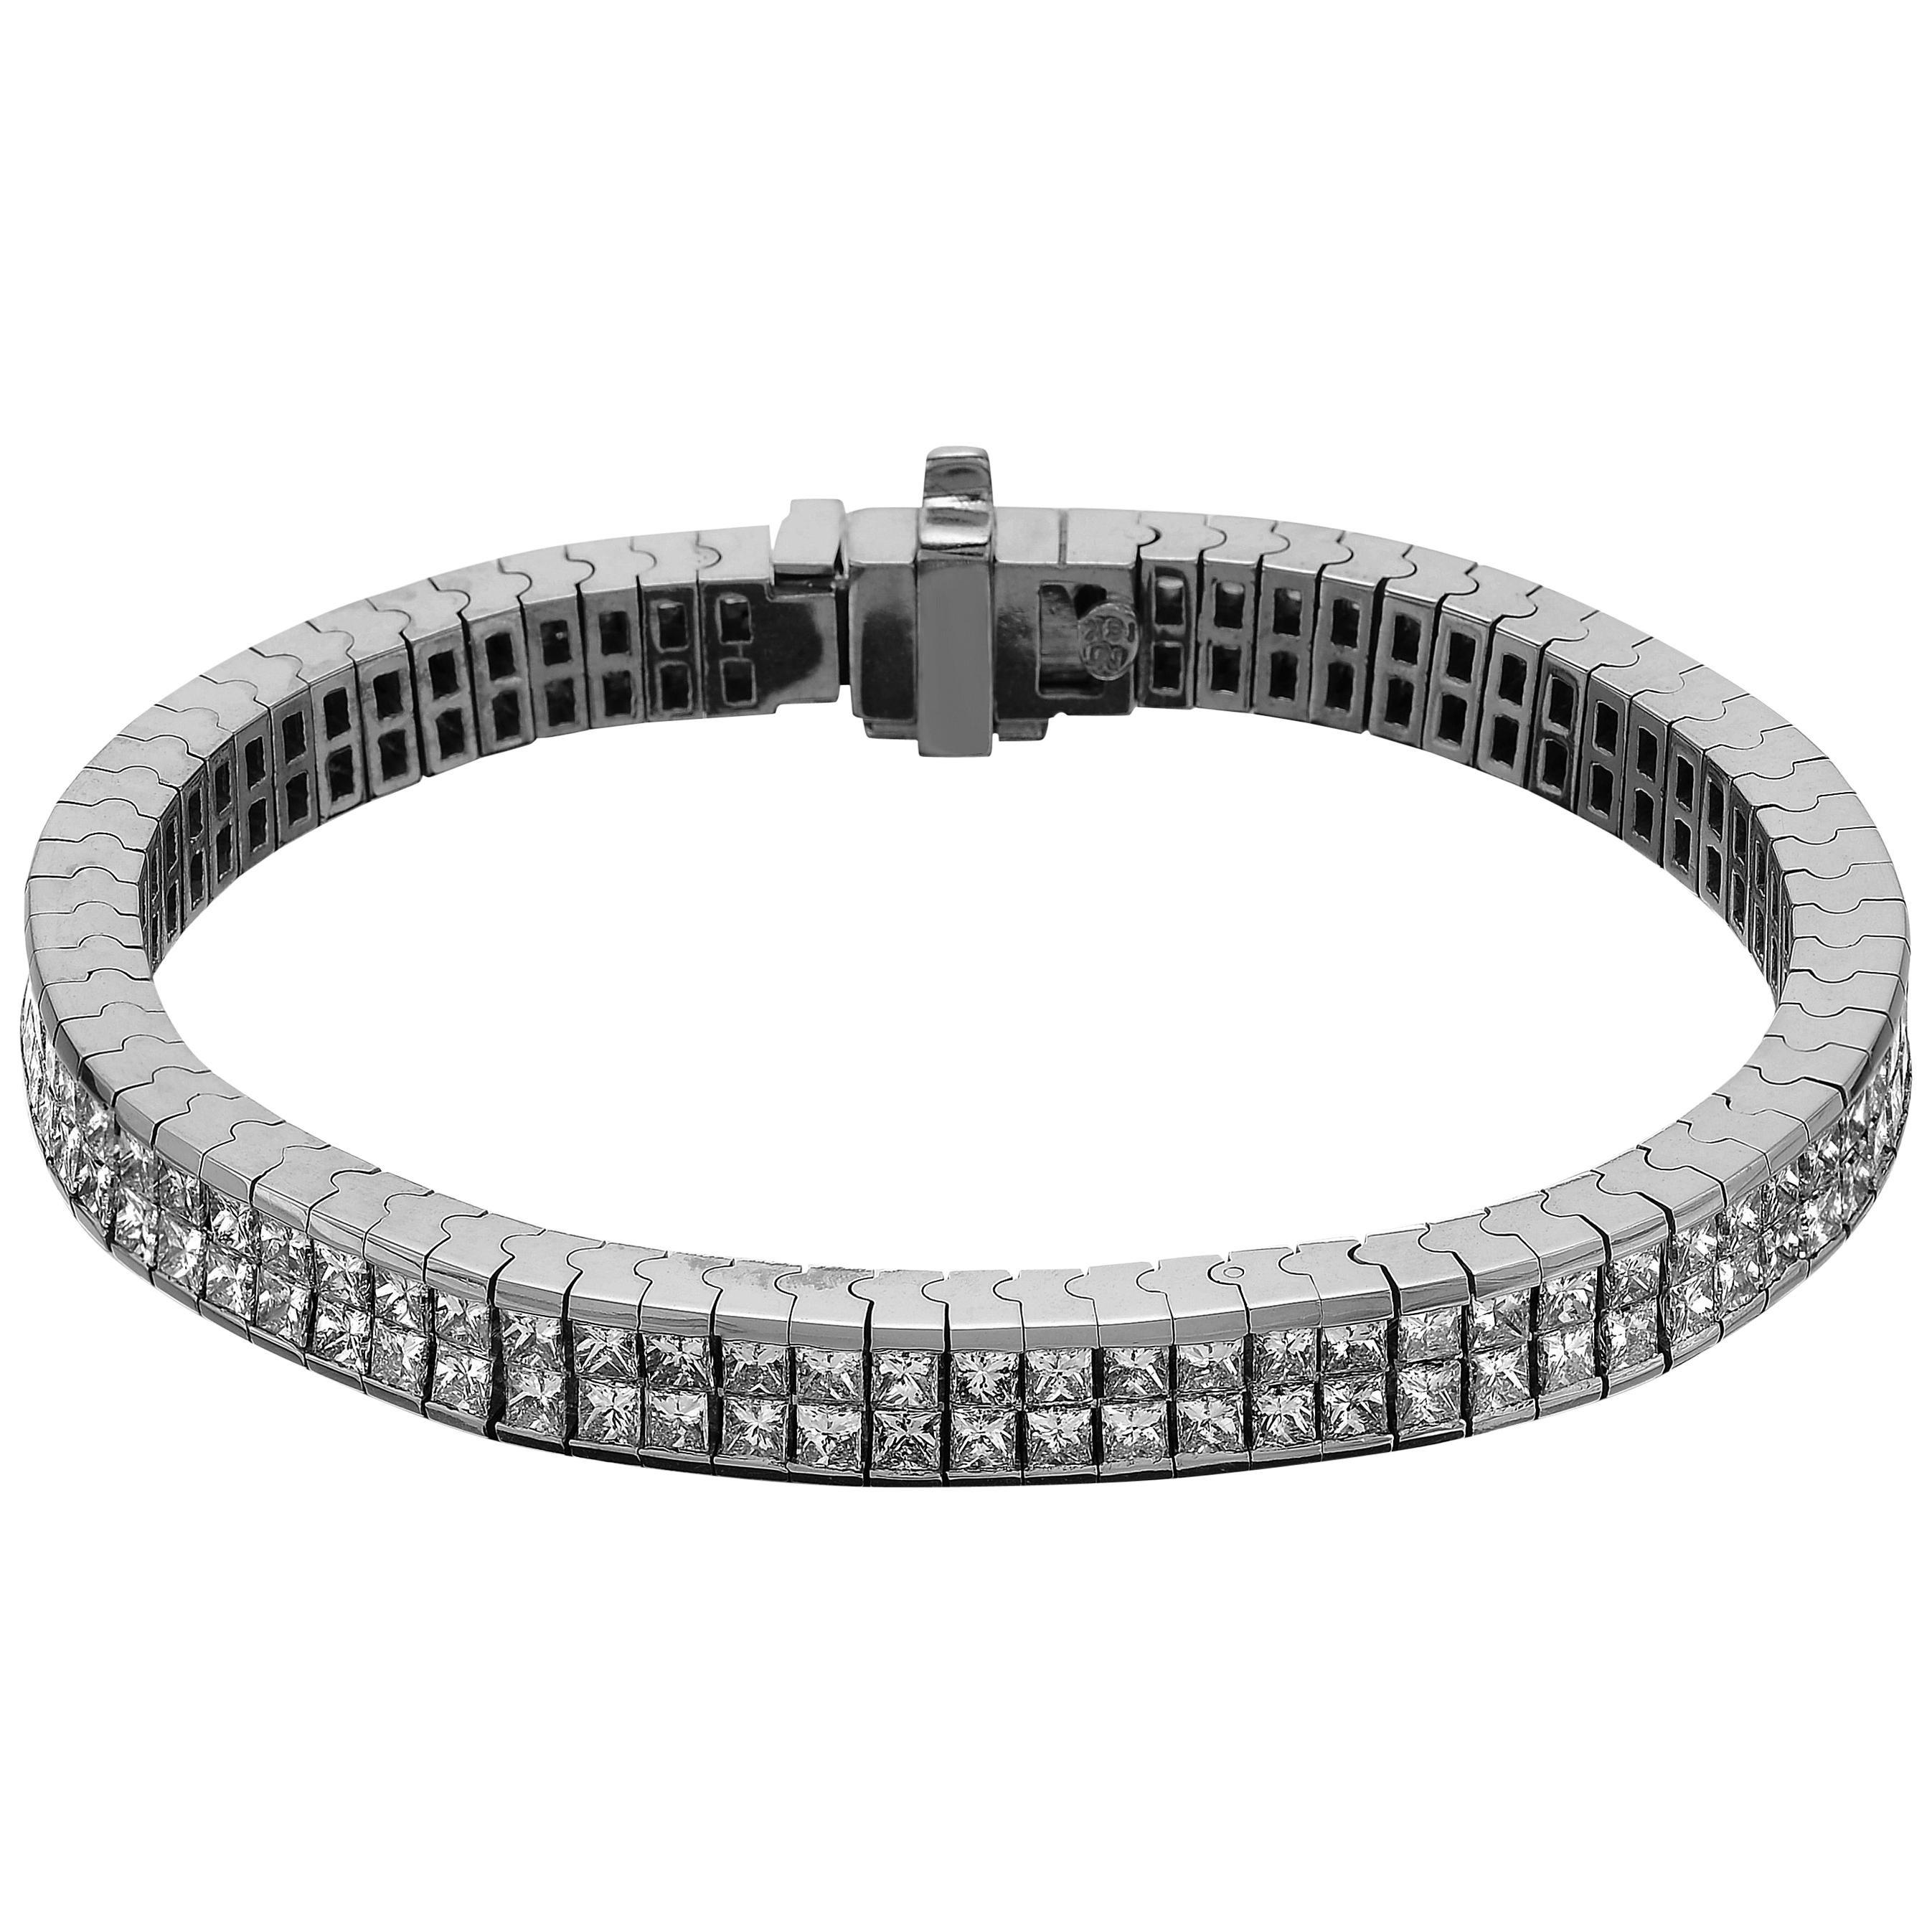 Princess Cut Diamond Double-Row Tennis Bracelet, Invisible set 18K White Gold